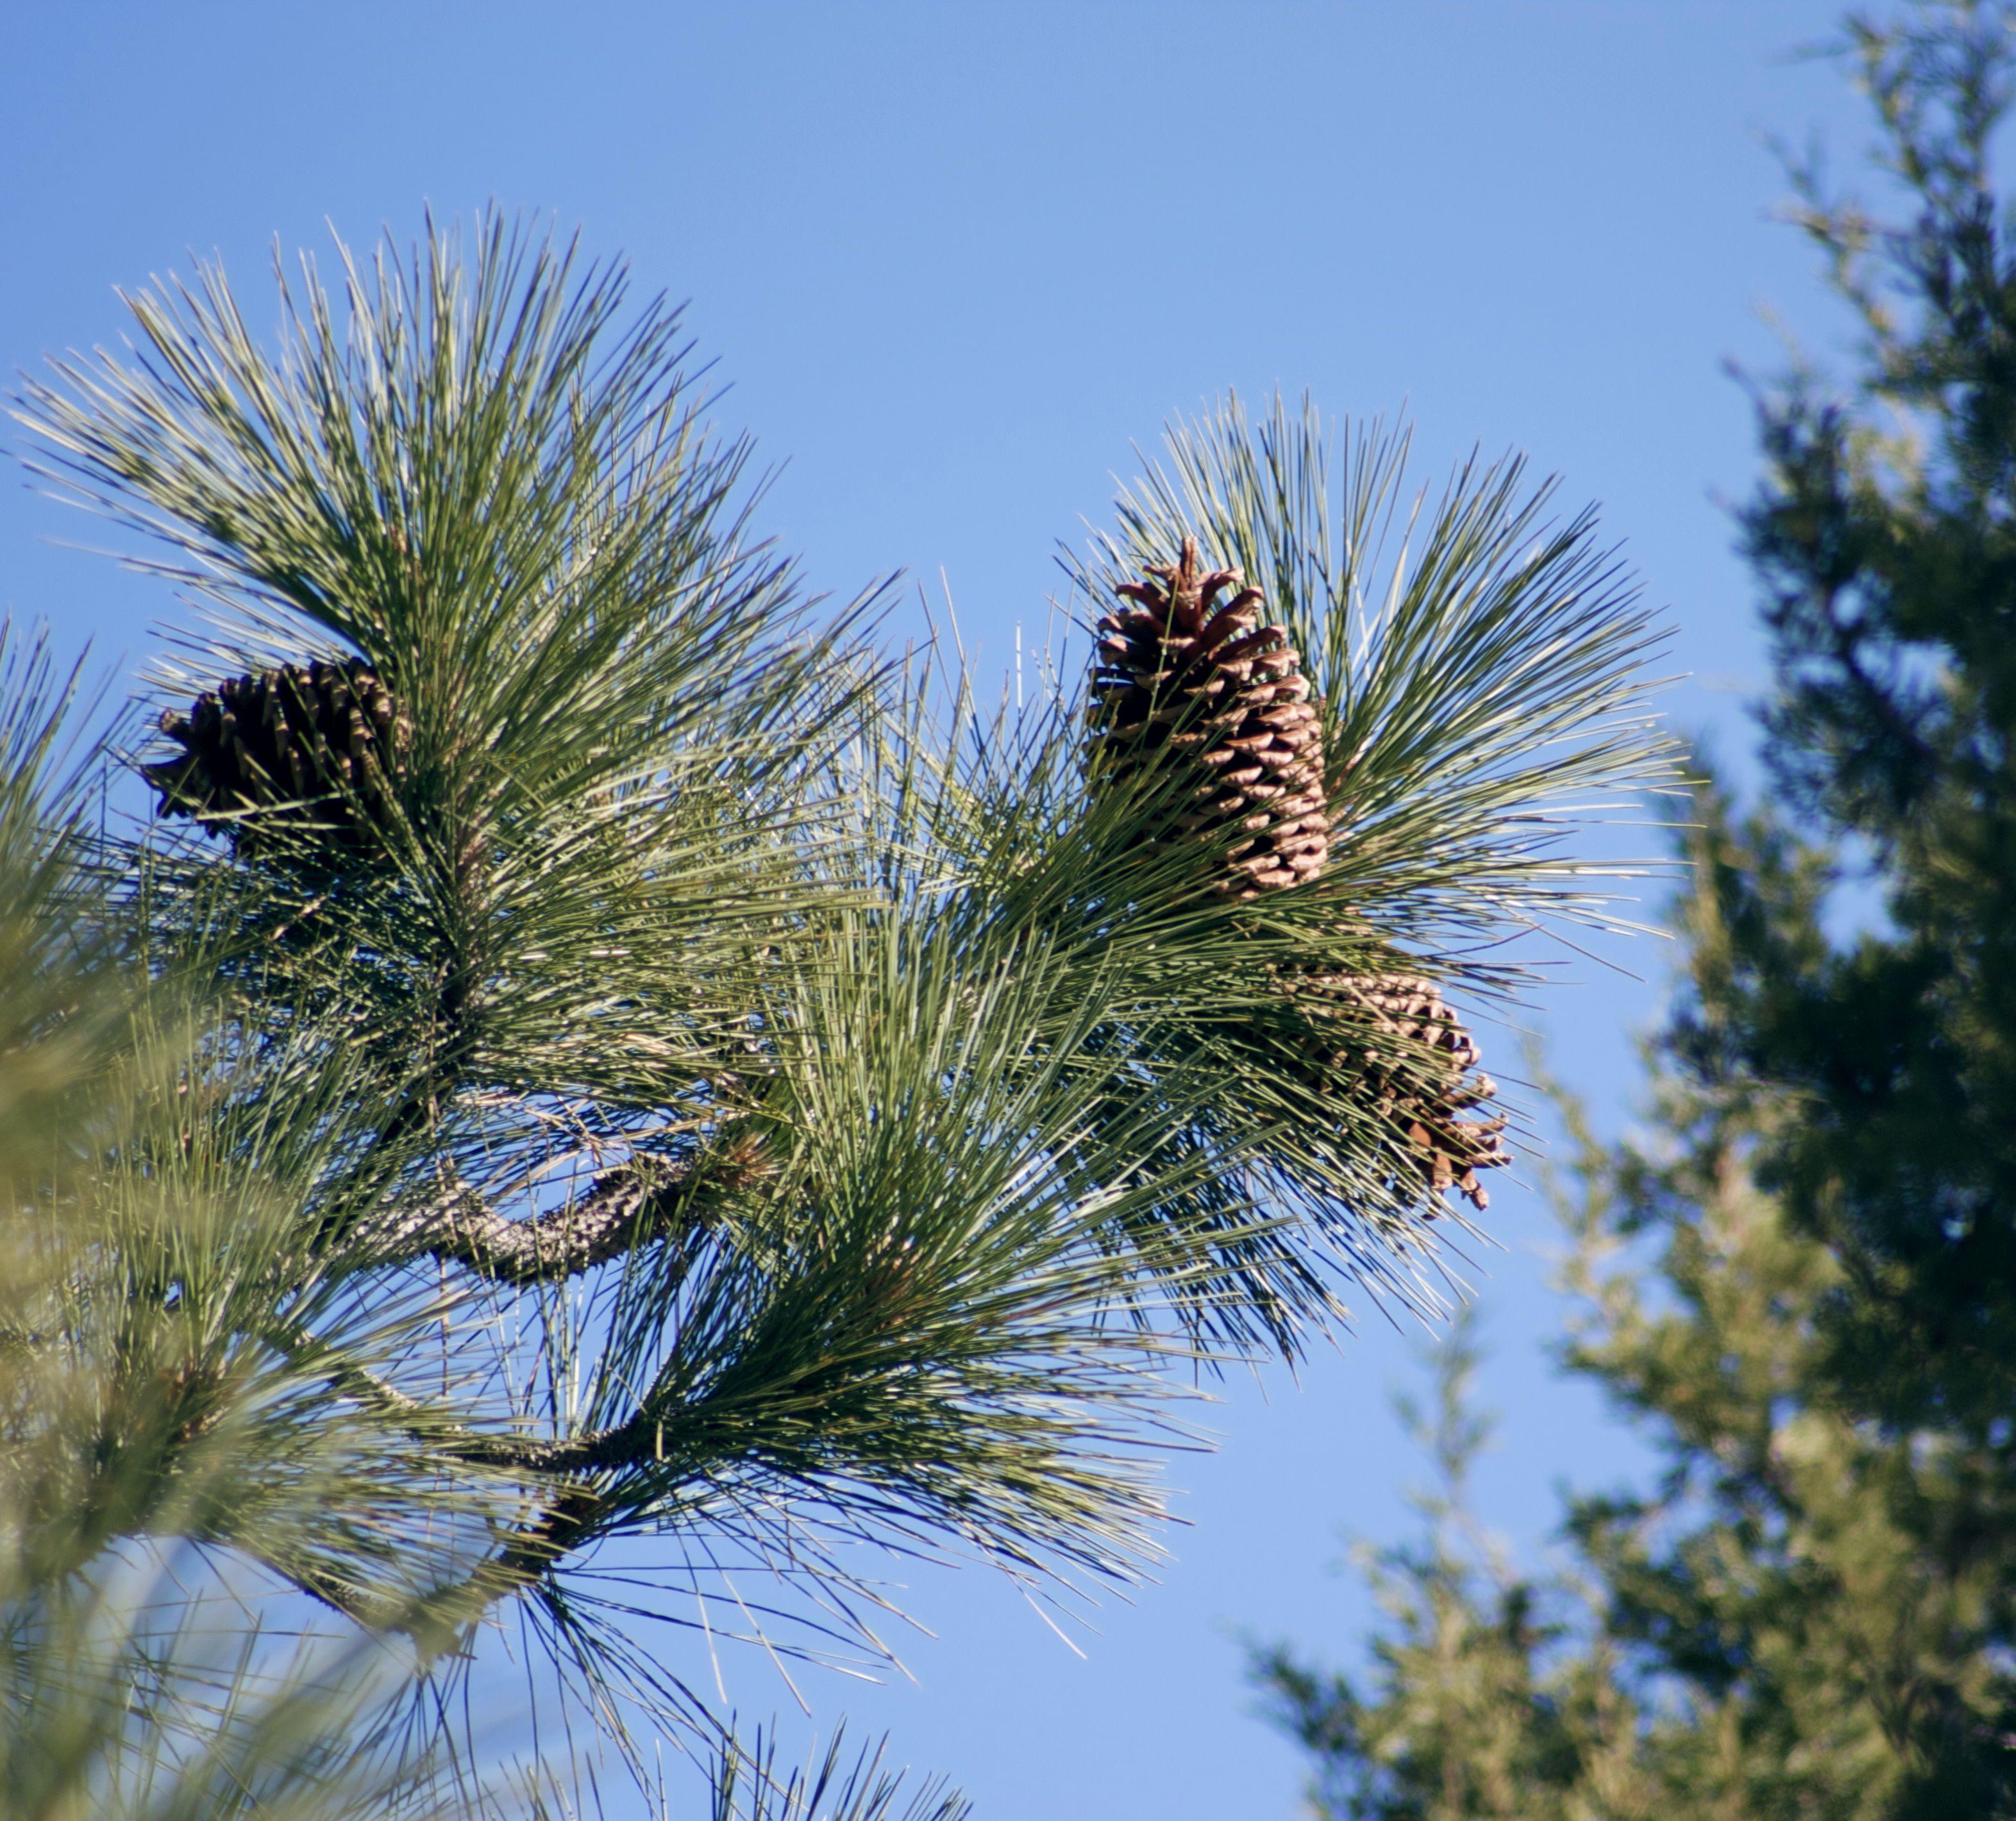 Jeffrey pine tree branch.